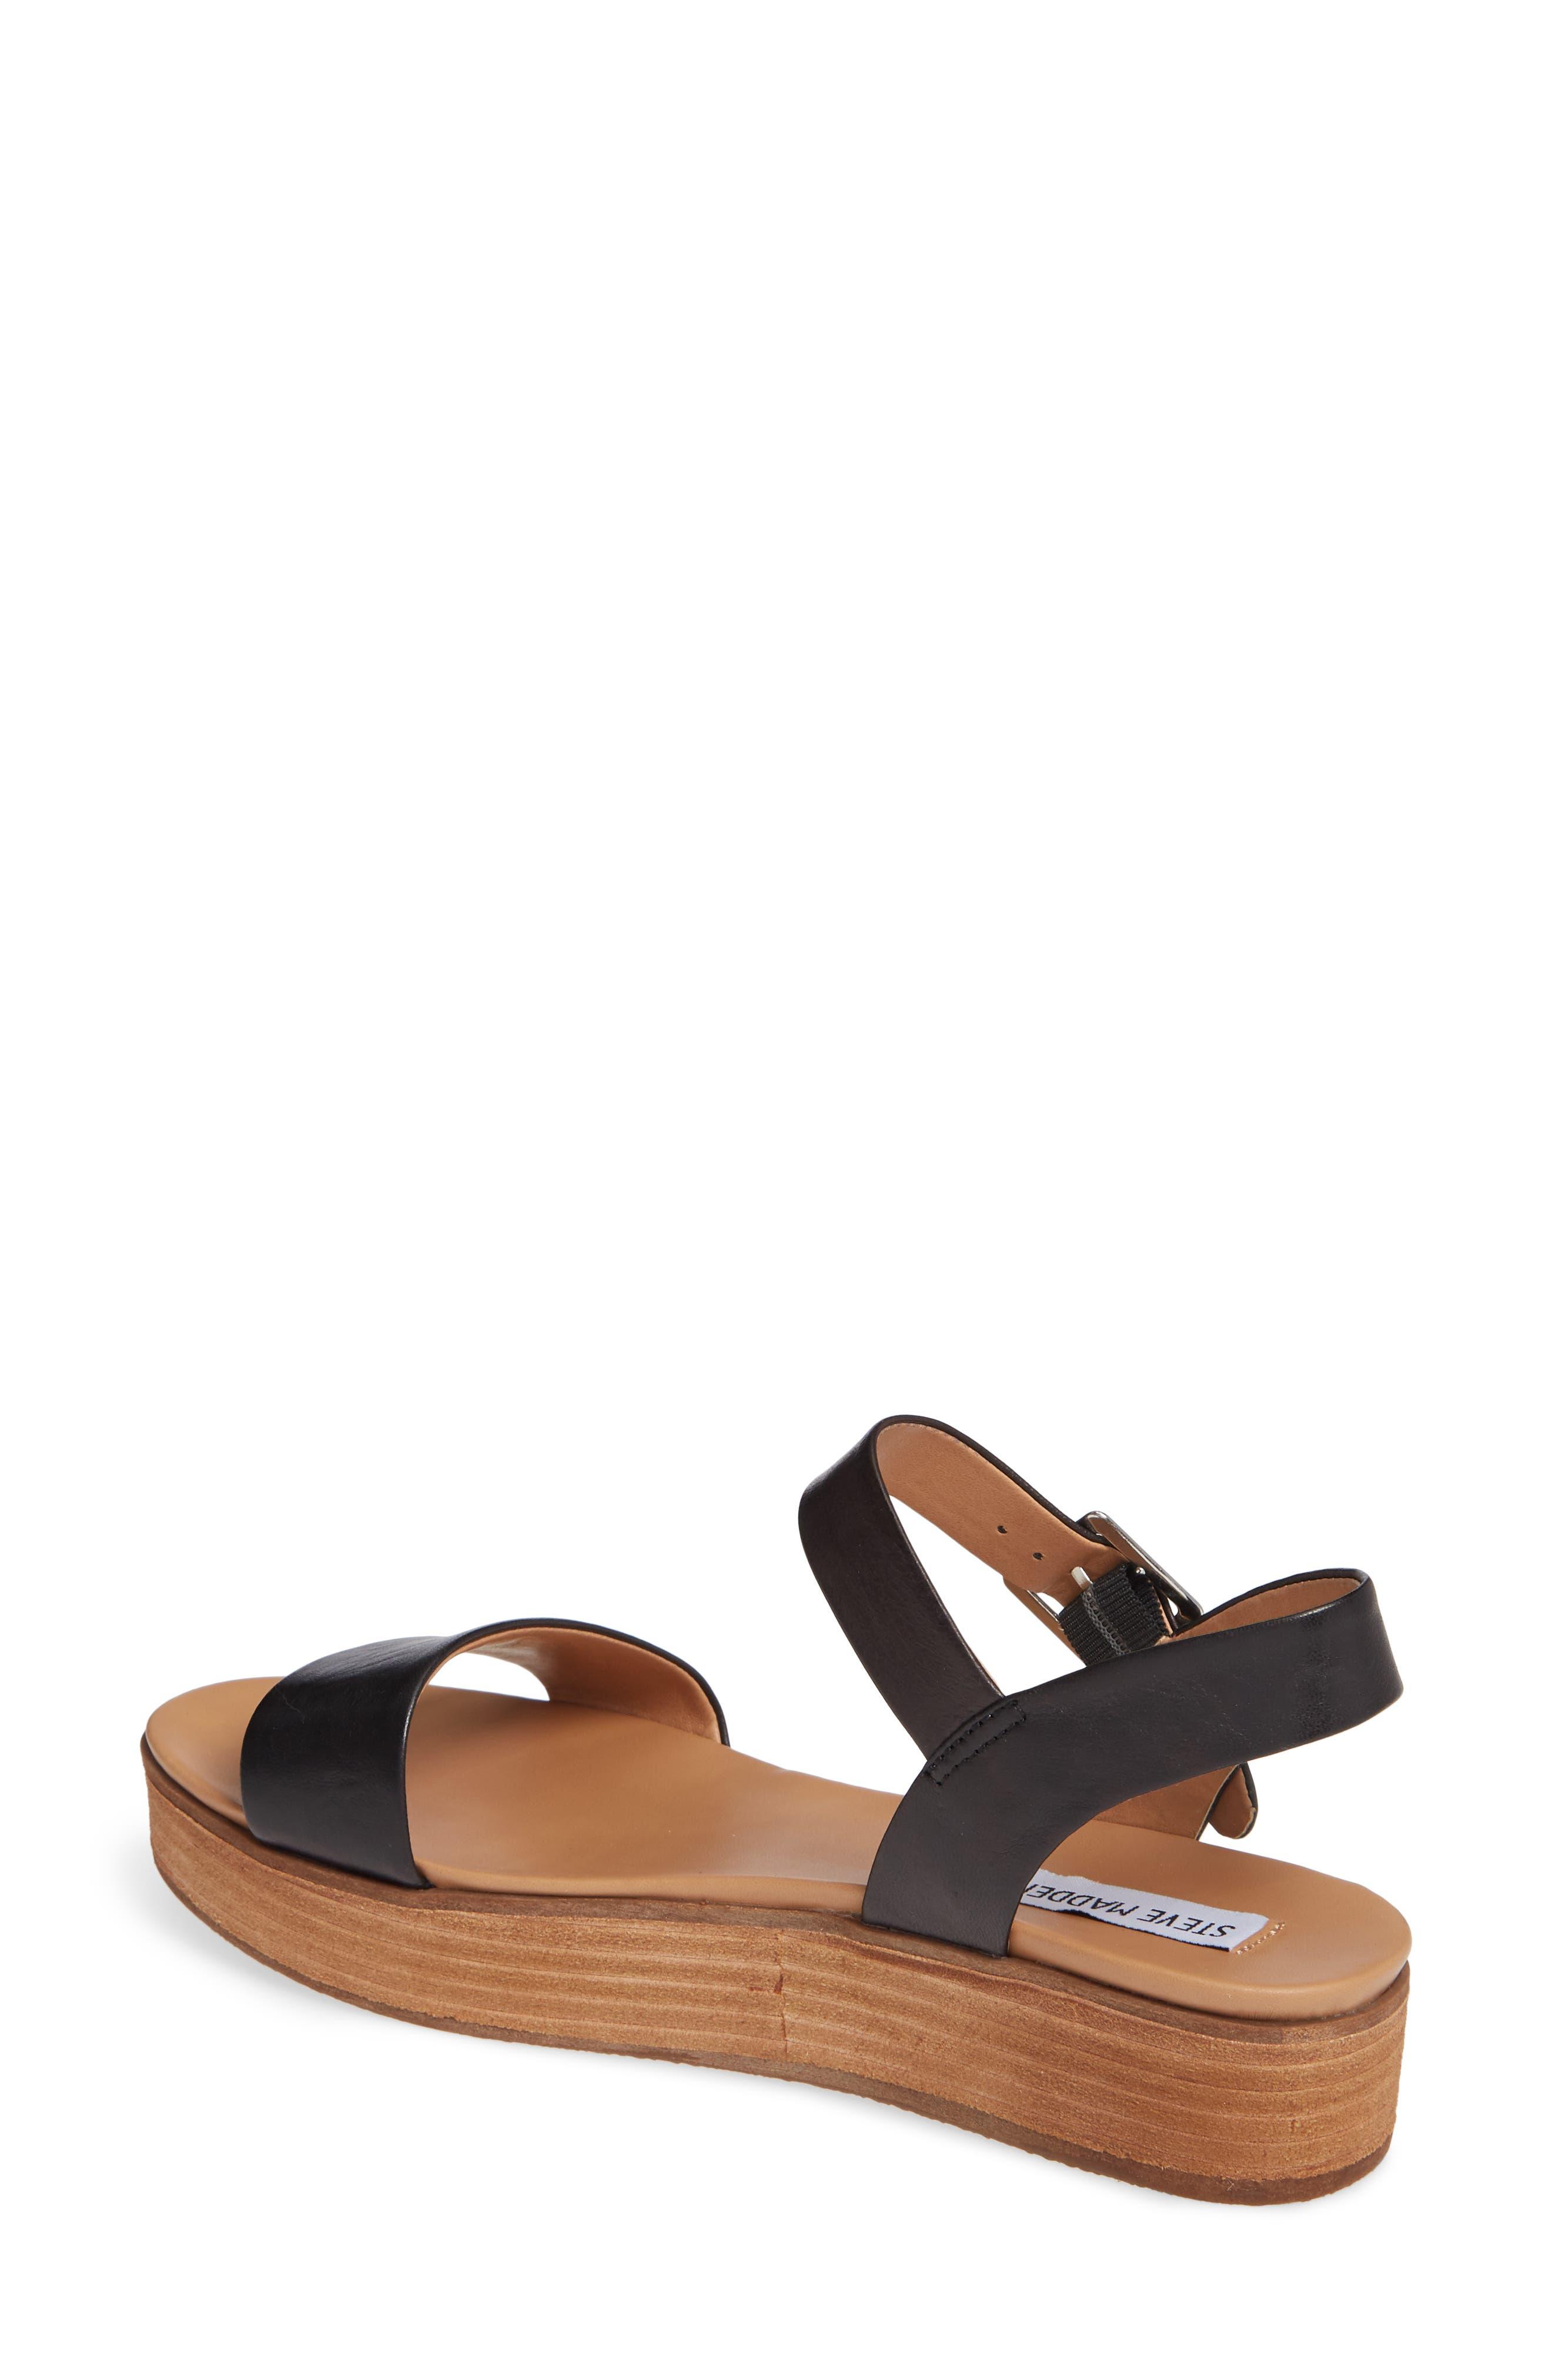 STEVE MADDEN, Aida Platform Sandal, Alternate thumbnail 2, color, BLACK LEATHER